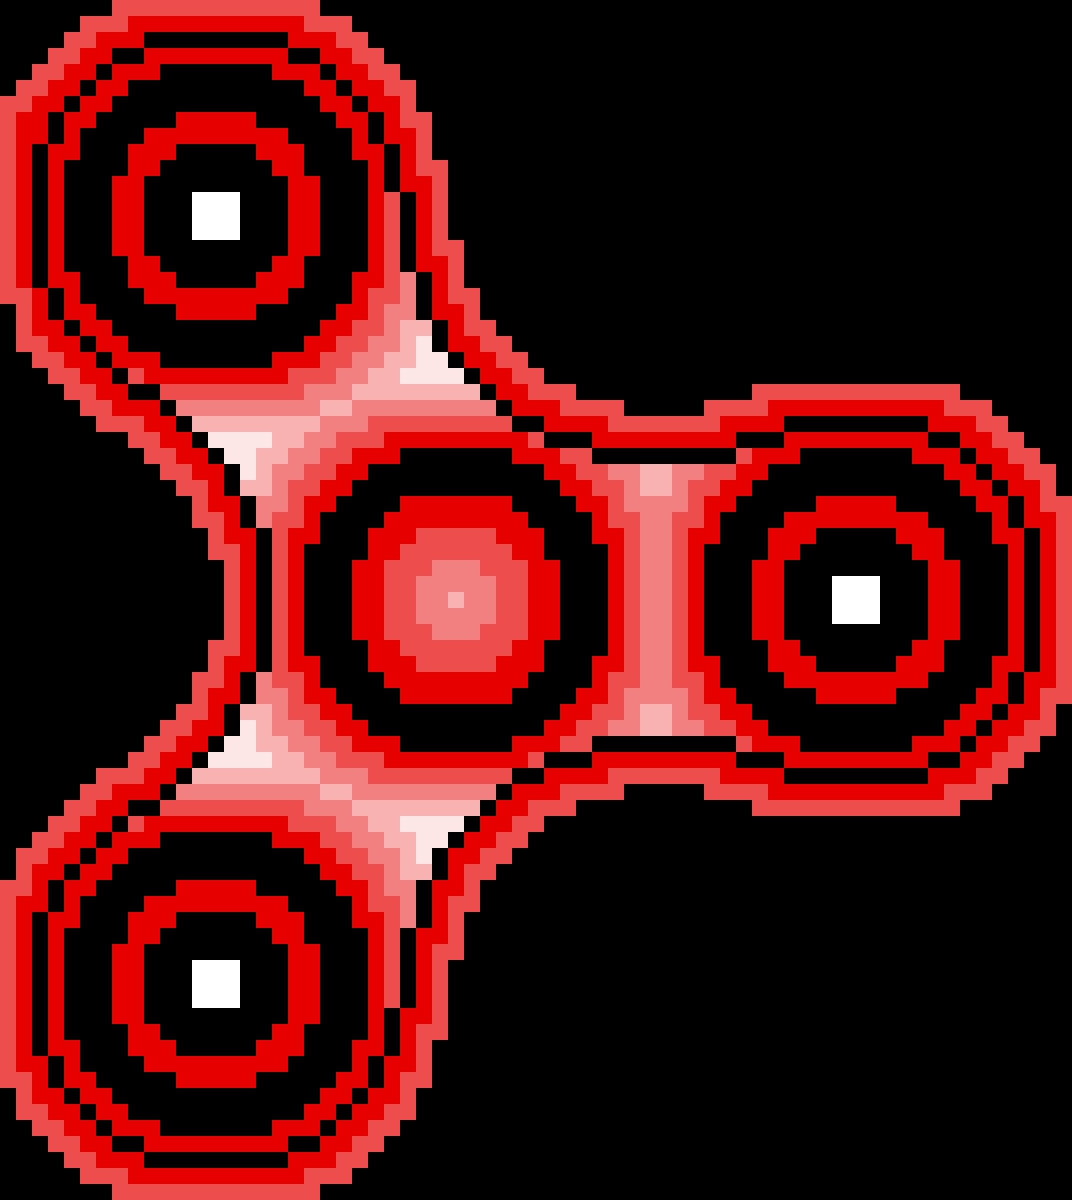 Pixilart - Red Fidget Spinner by swagmaster69696 - photo#50